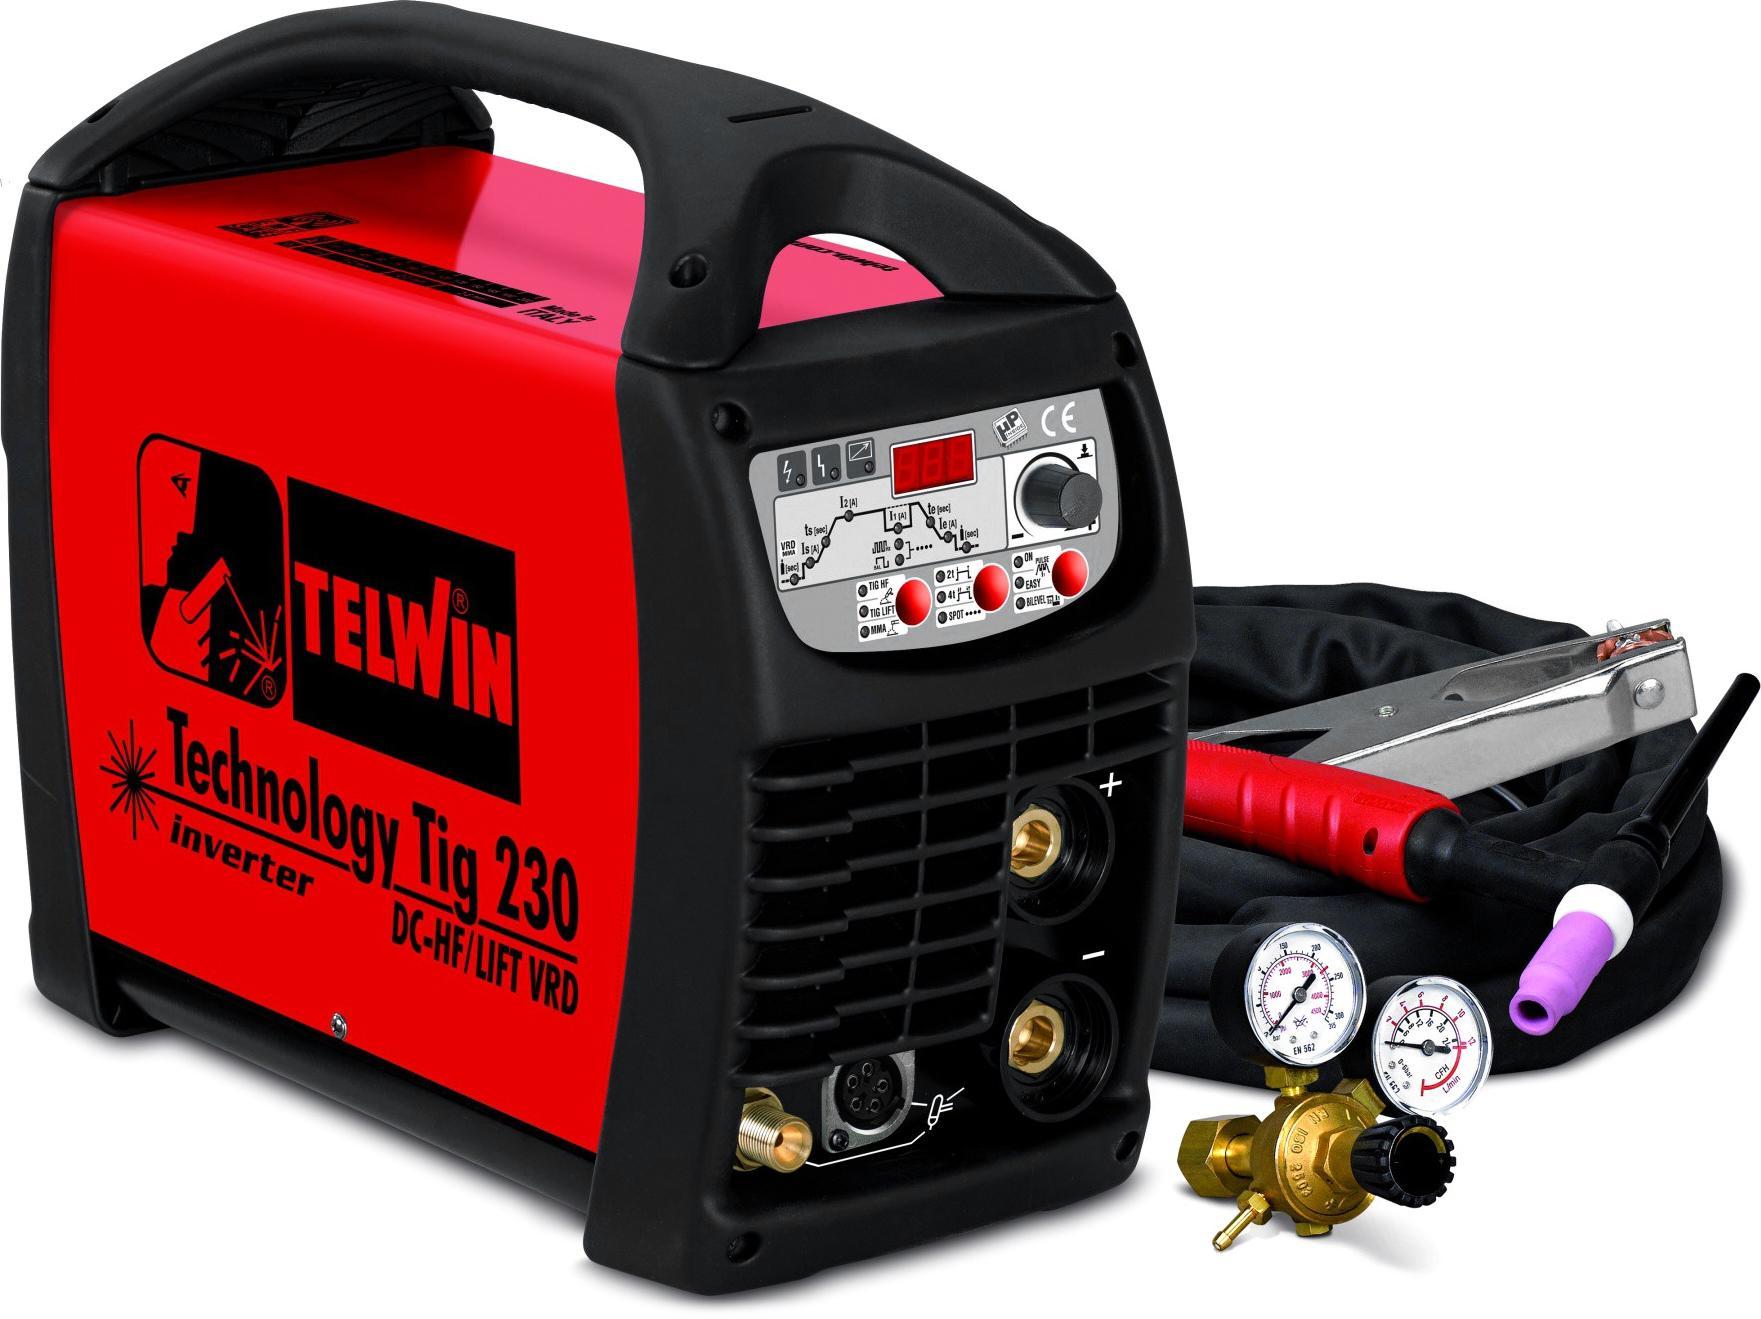 Сварочный аппарат Telwin Technology tig 230 dc-hf/lift vrd 230v + tig acc (852055)